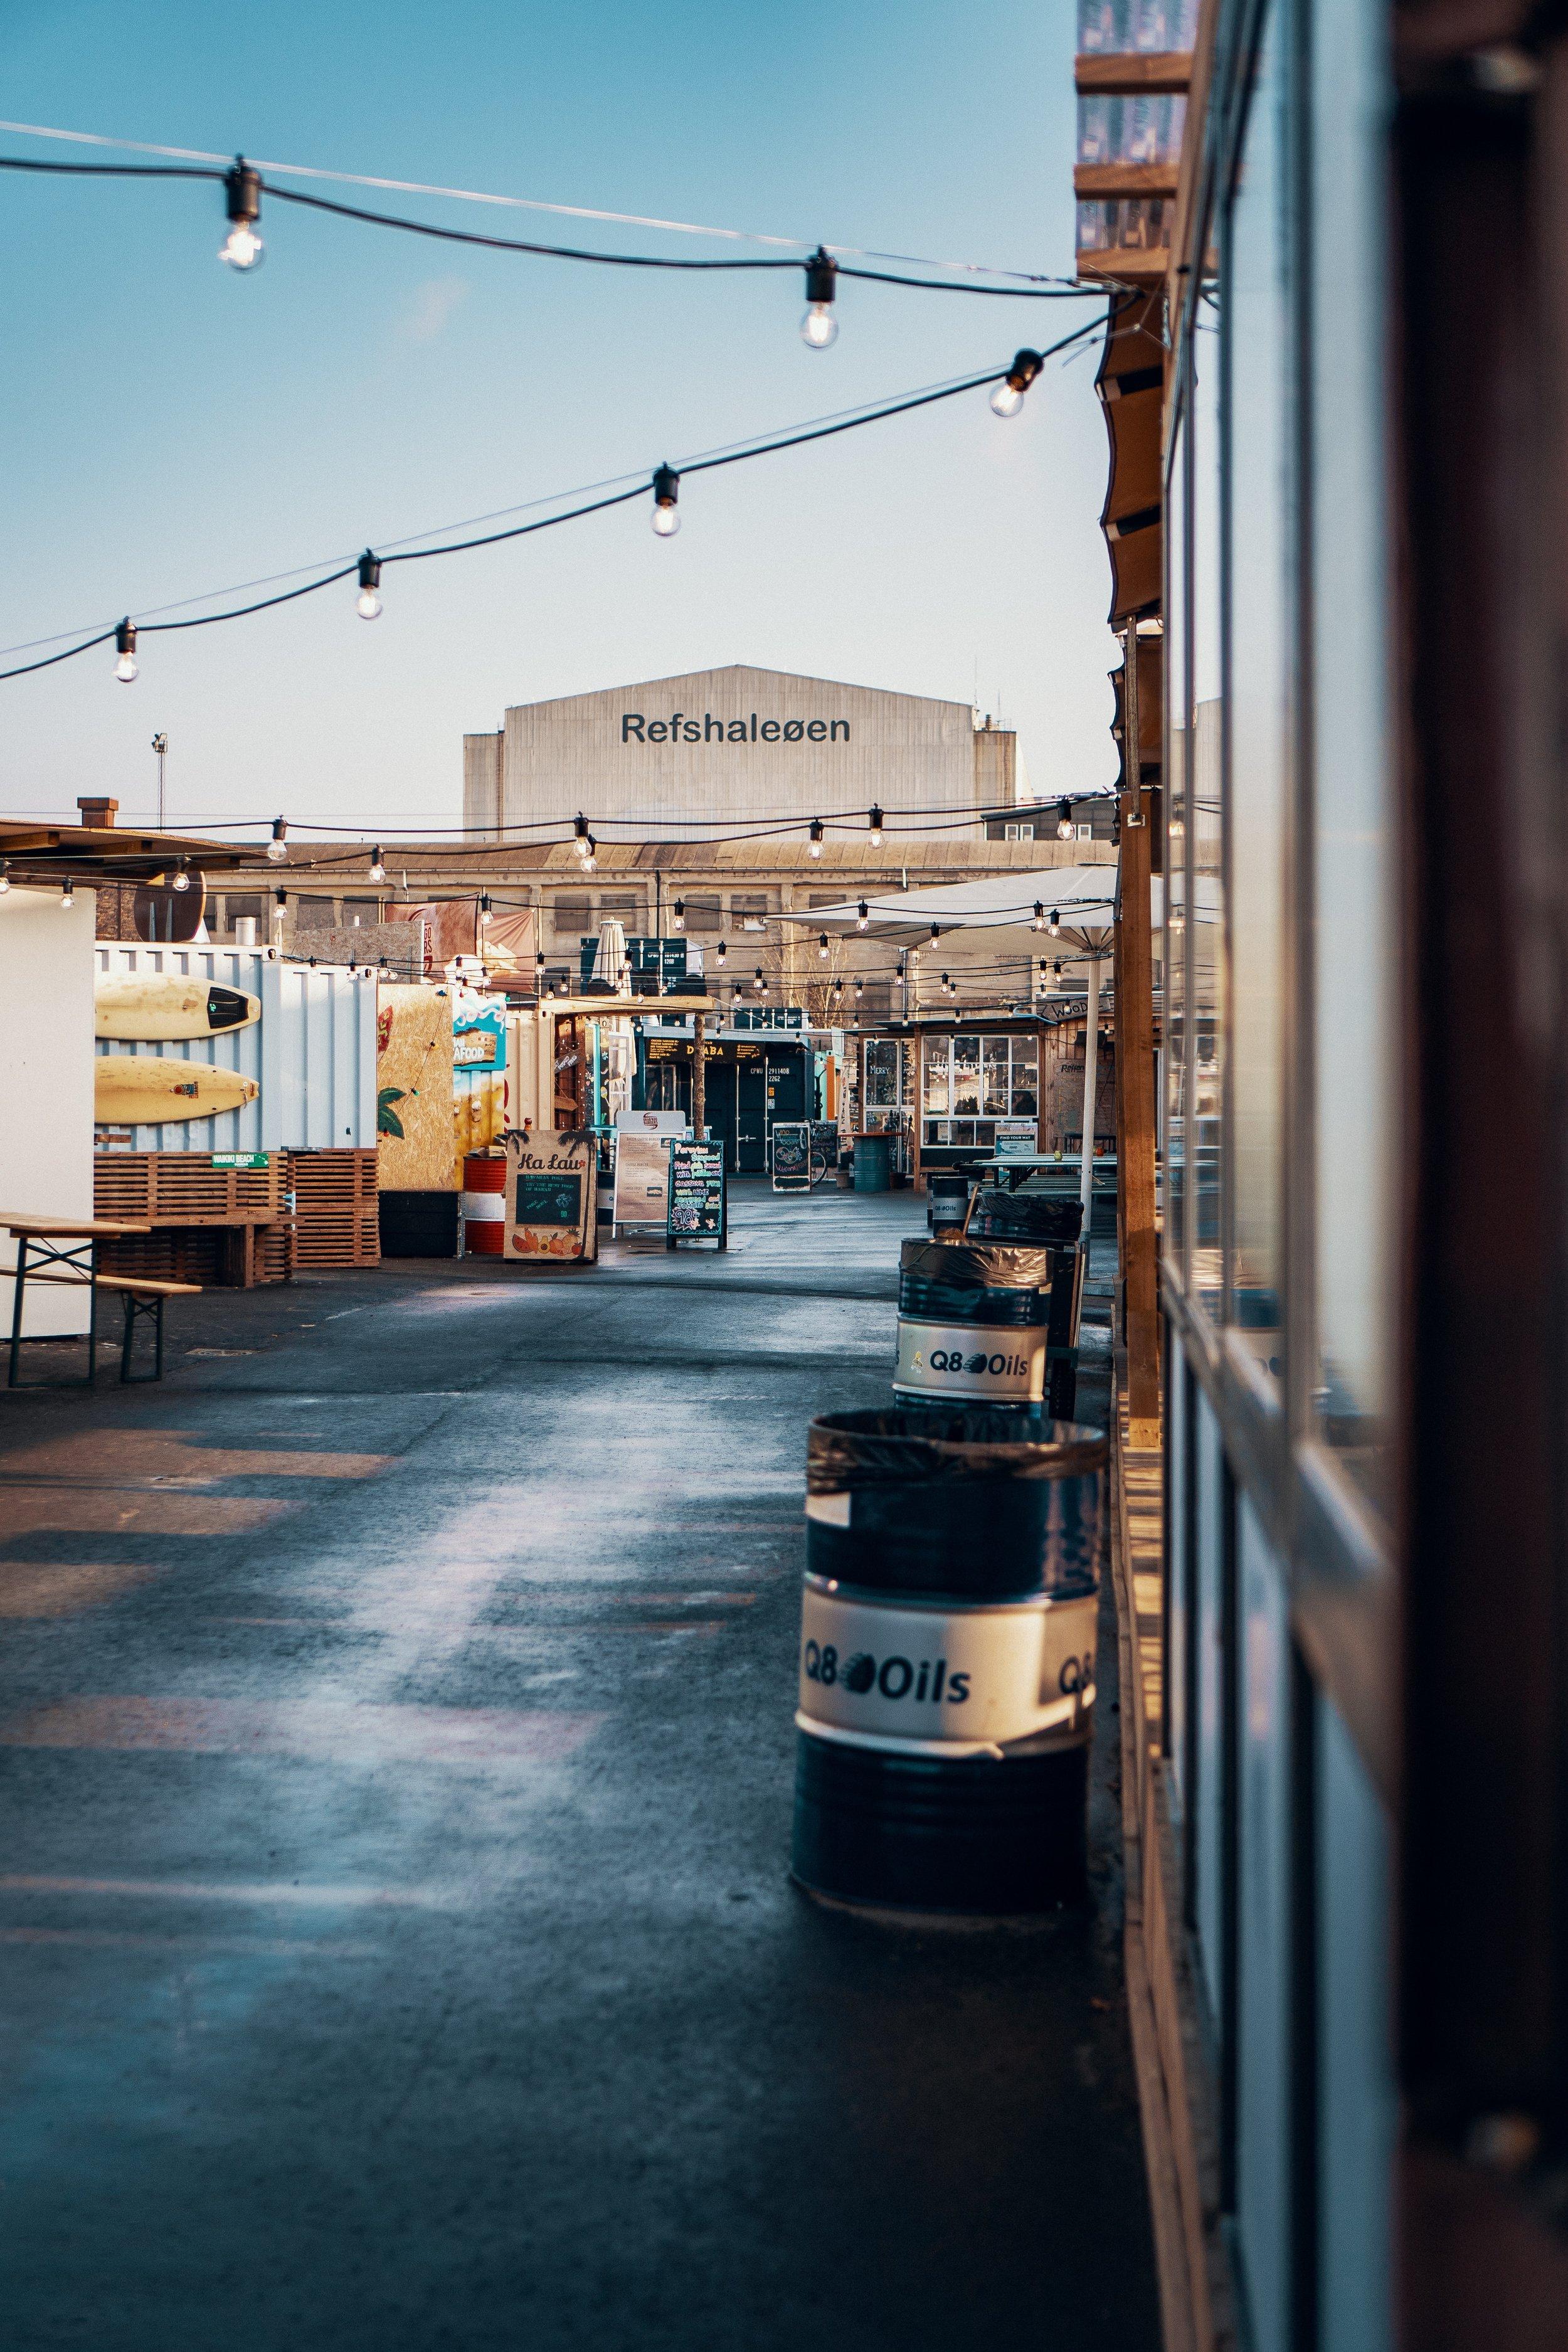 Copenhagen Street Food Market - Reffen